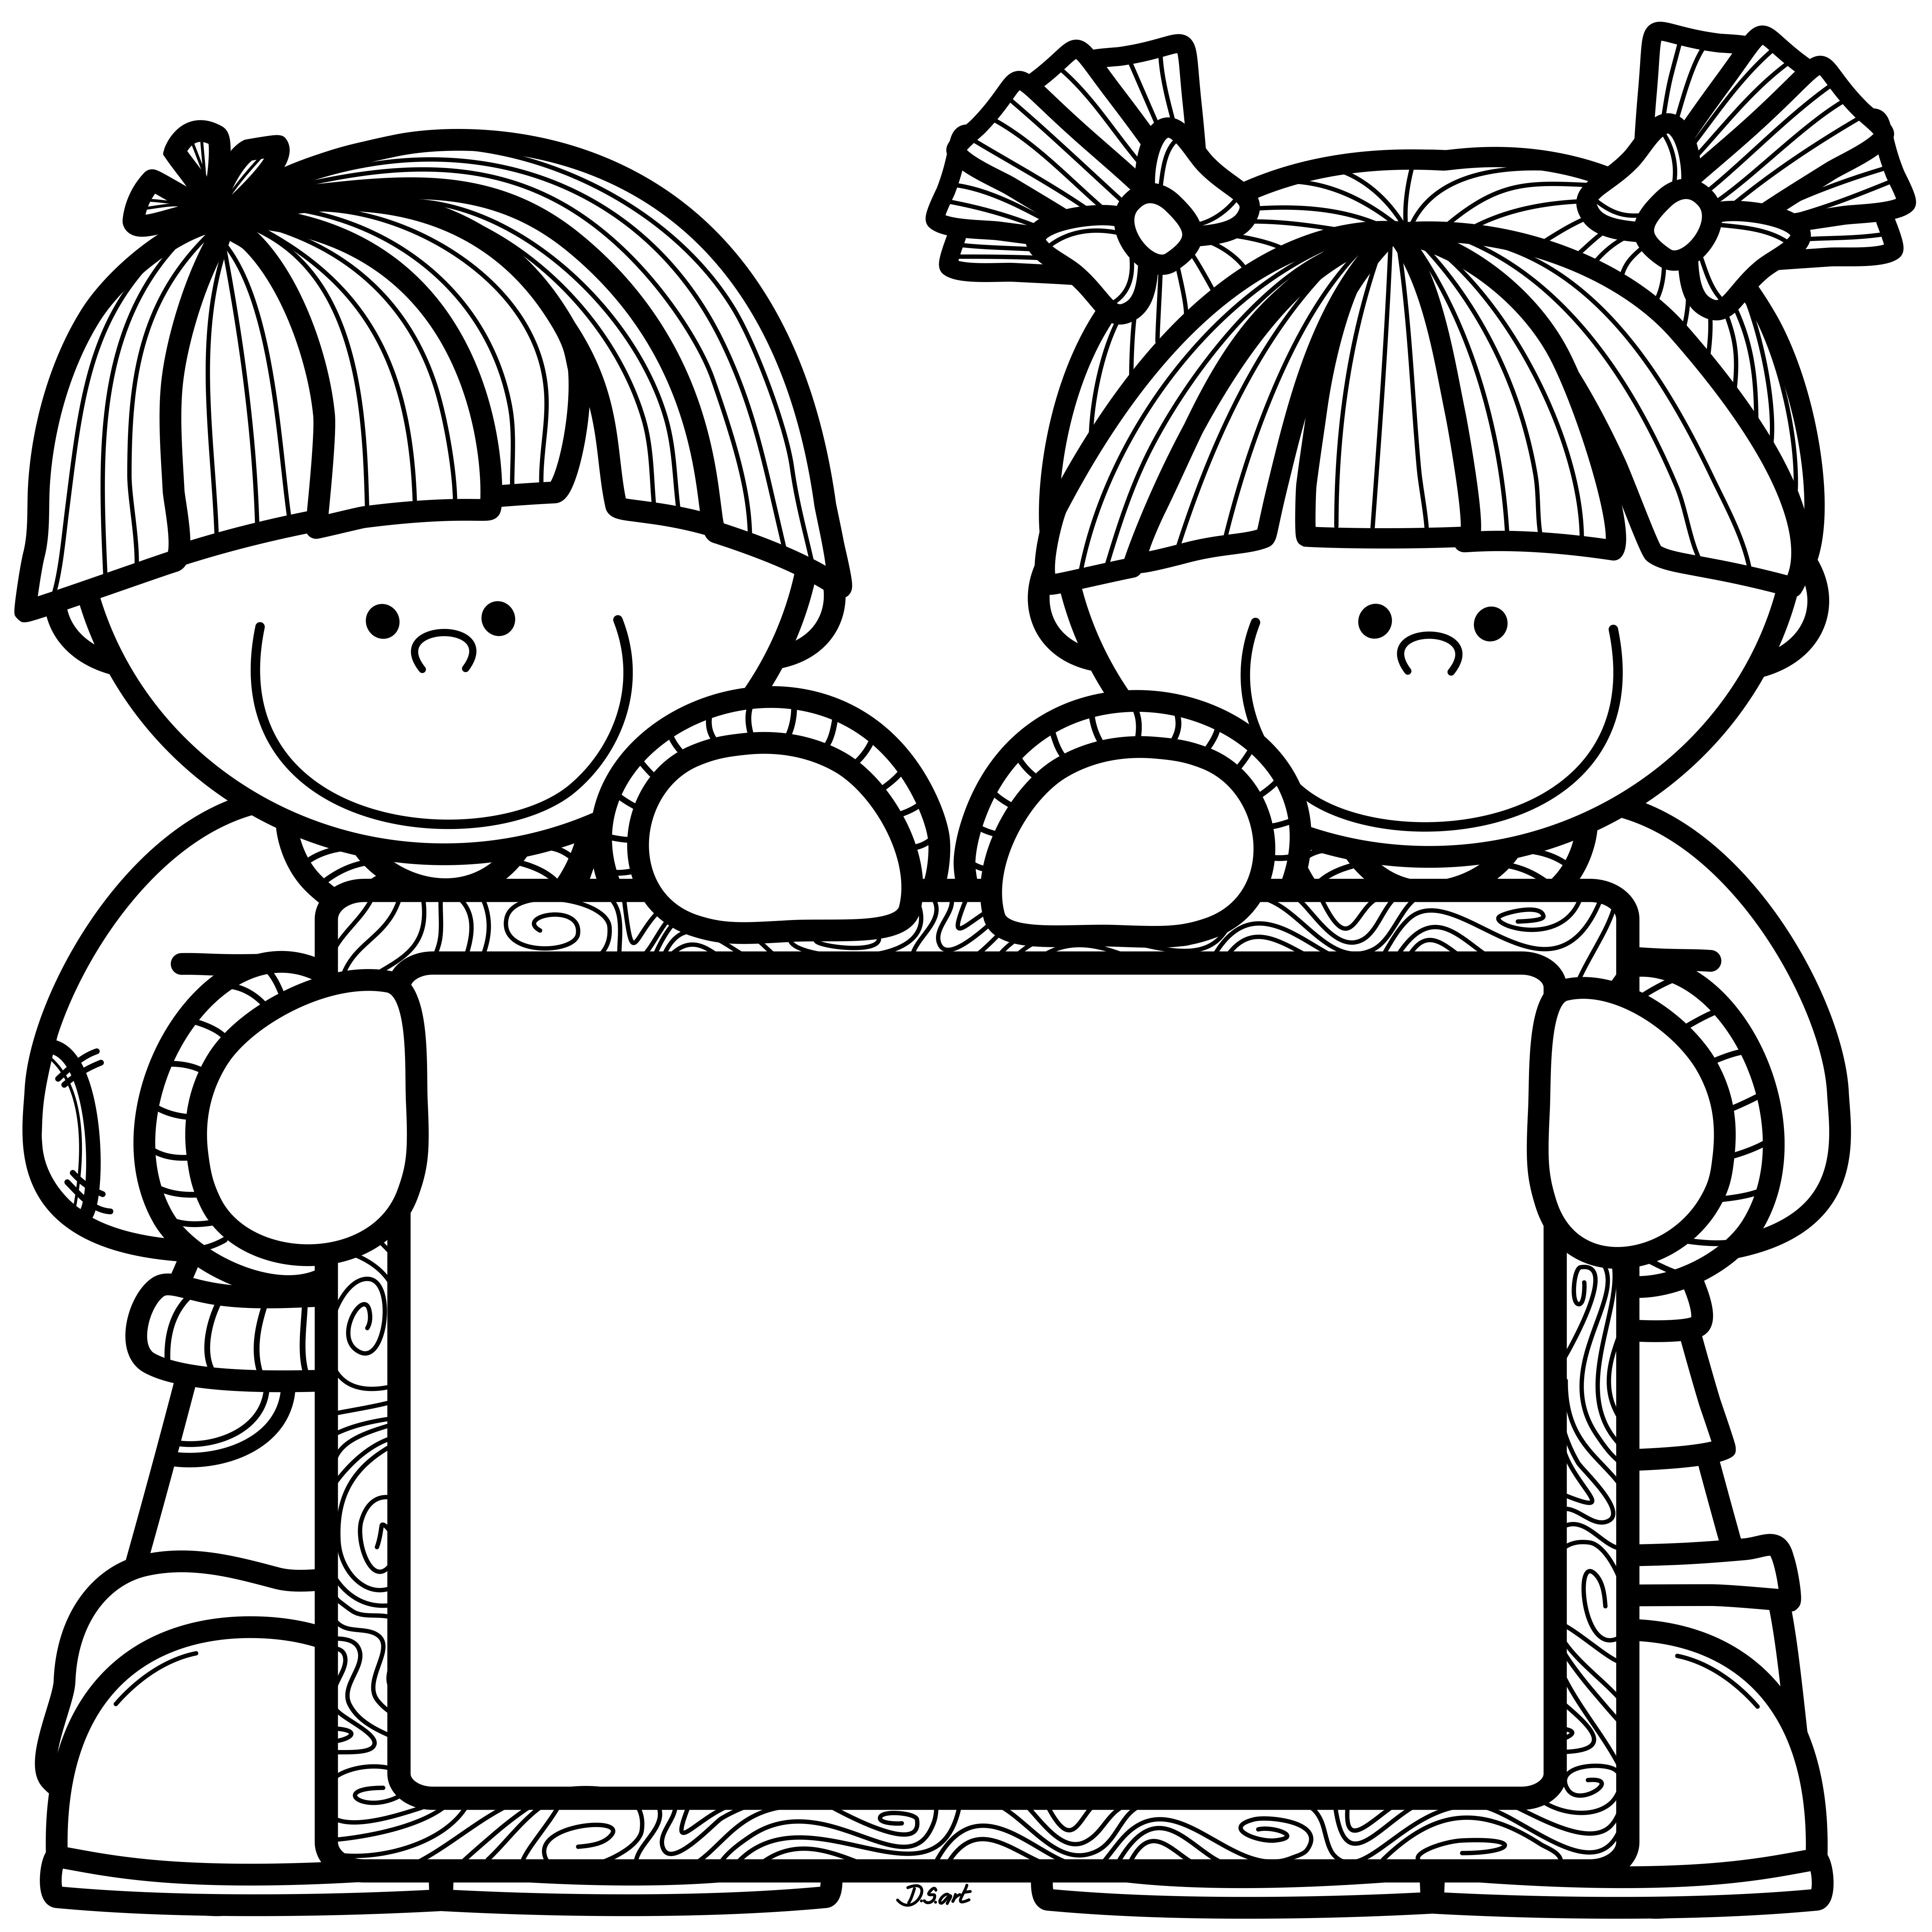 ✿* CREALO TU *✿* | Melonheadz blanco y negro | Pinterest ...